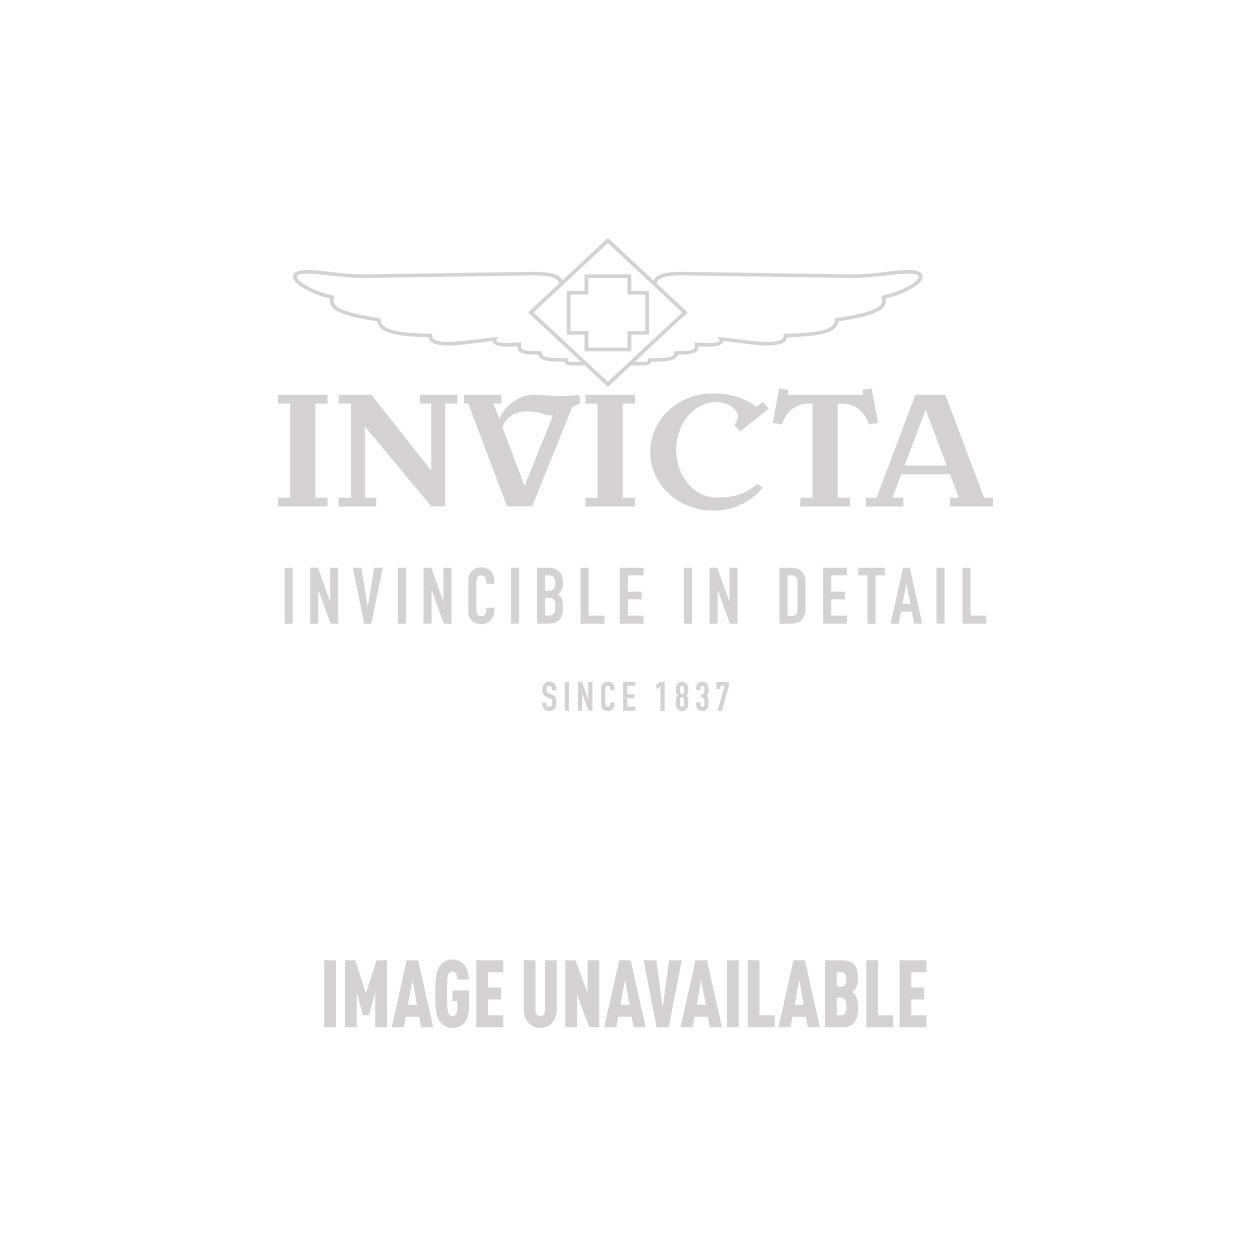 Invicta Corduba Swiss Movement Quartz Watch - Gold case with Beige tone Leather band - Model 90222